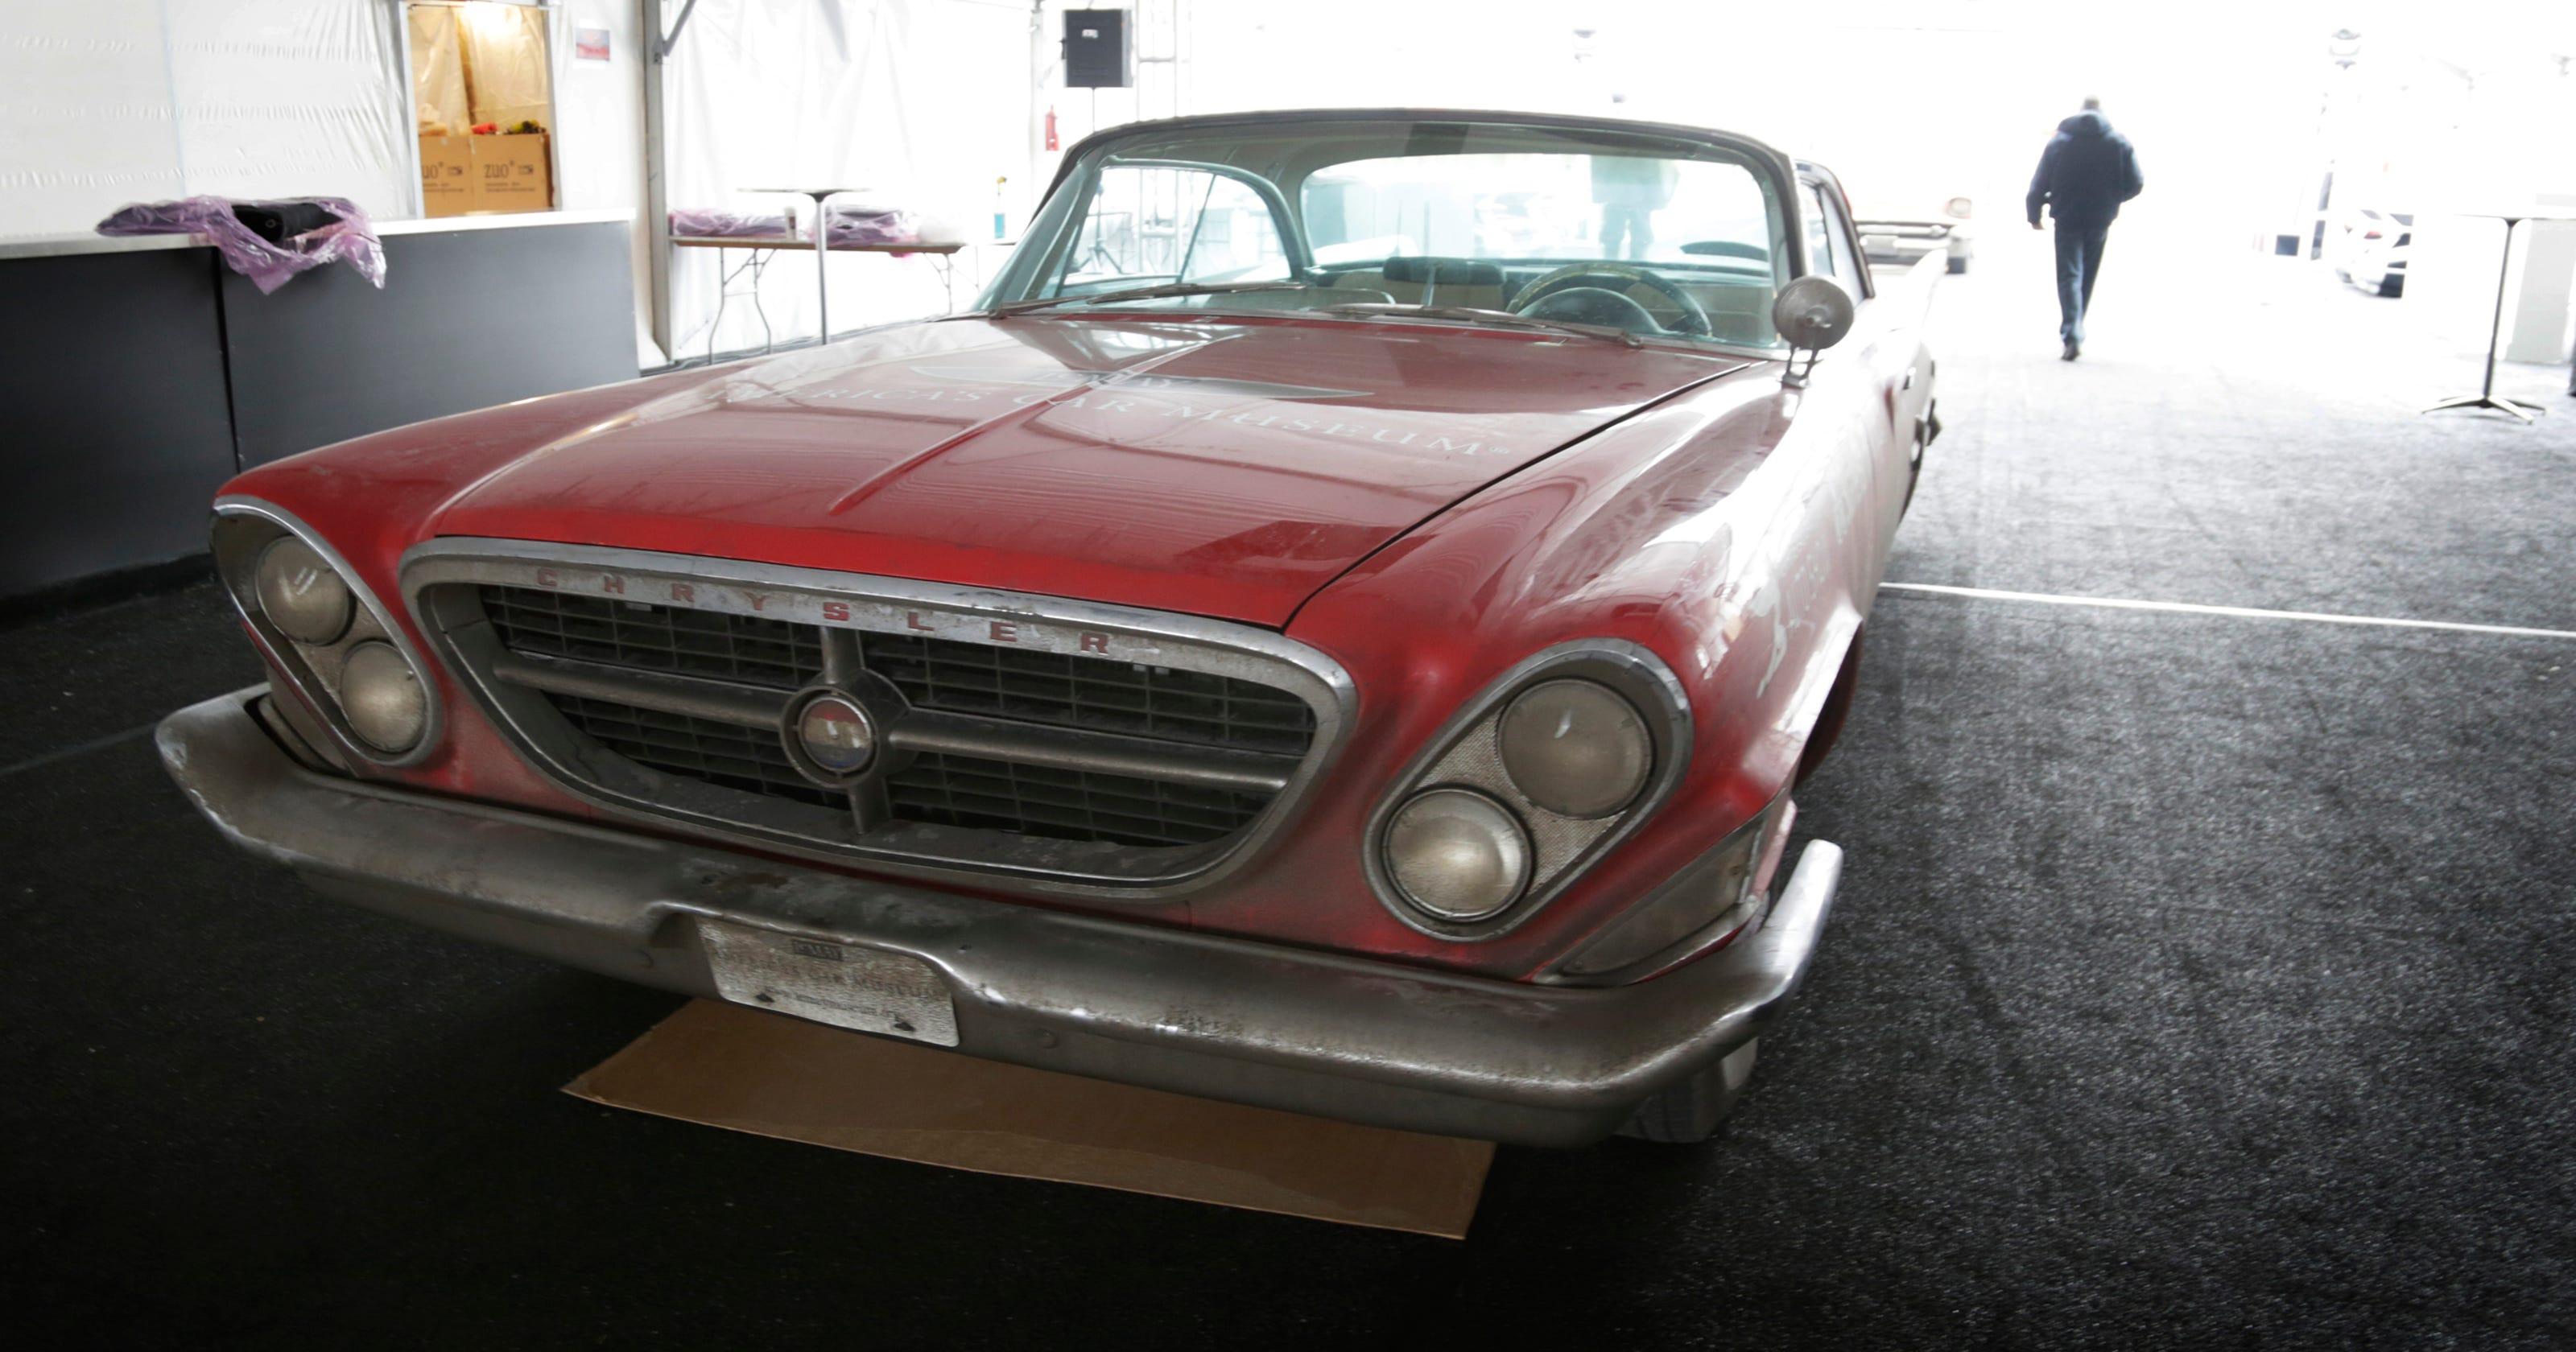 Detroit Free Press Auto >> 3 Bright Red Classics End 2 900 Mile Cruise To Auto Show